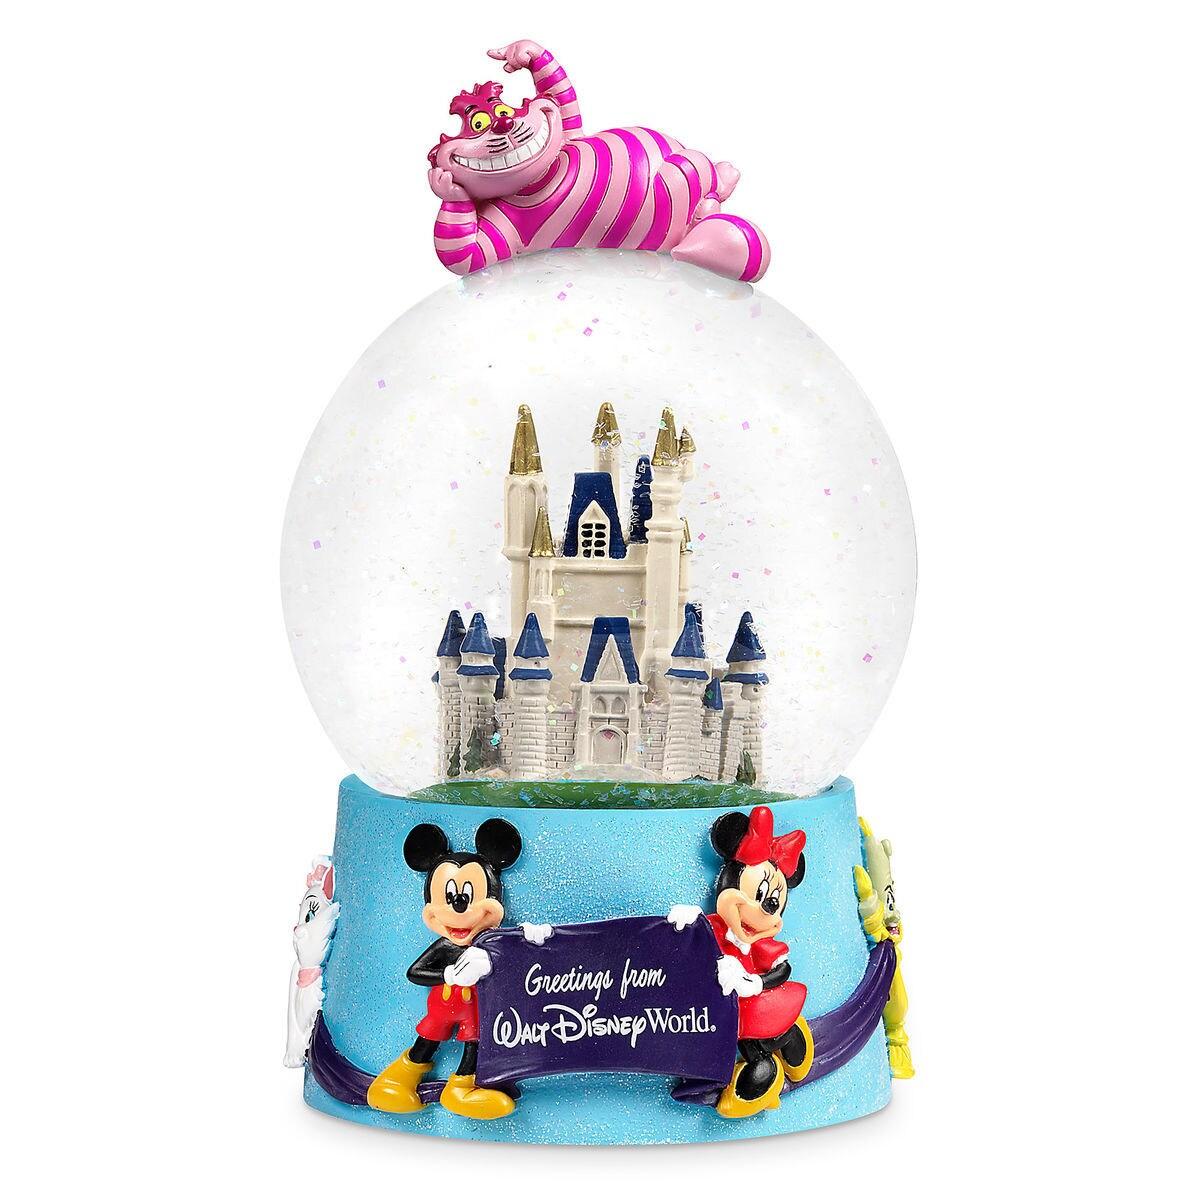 Walt Disney World Musical Snowglobe | shopDisney